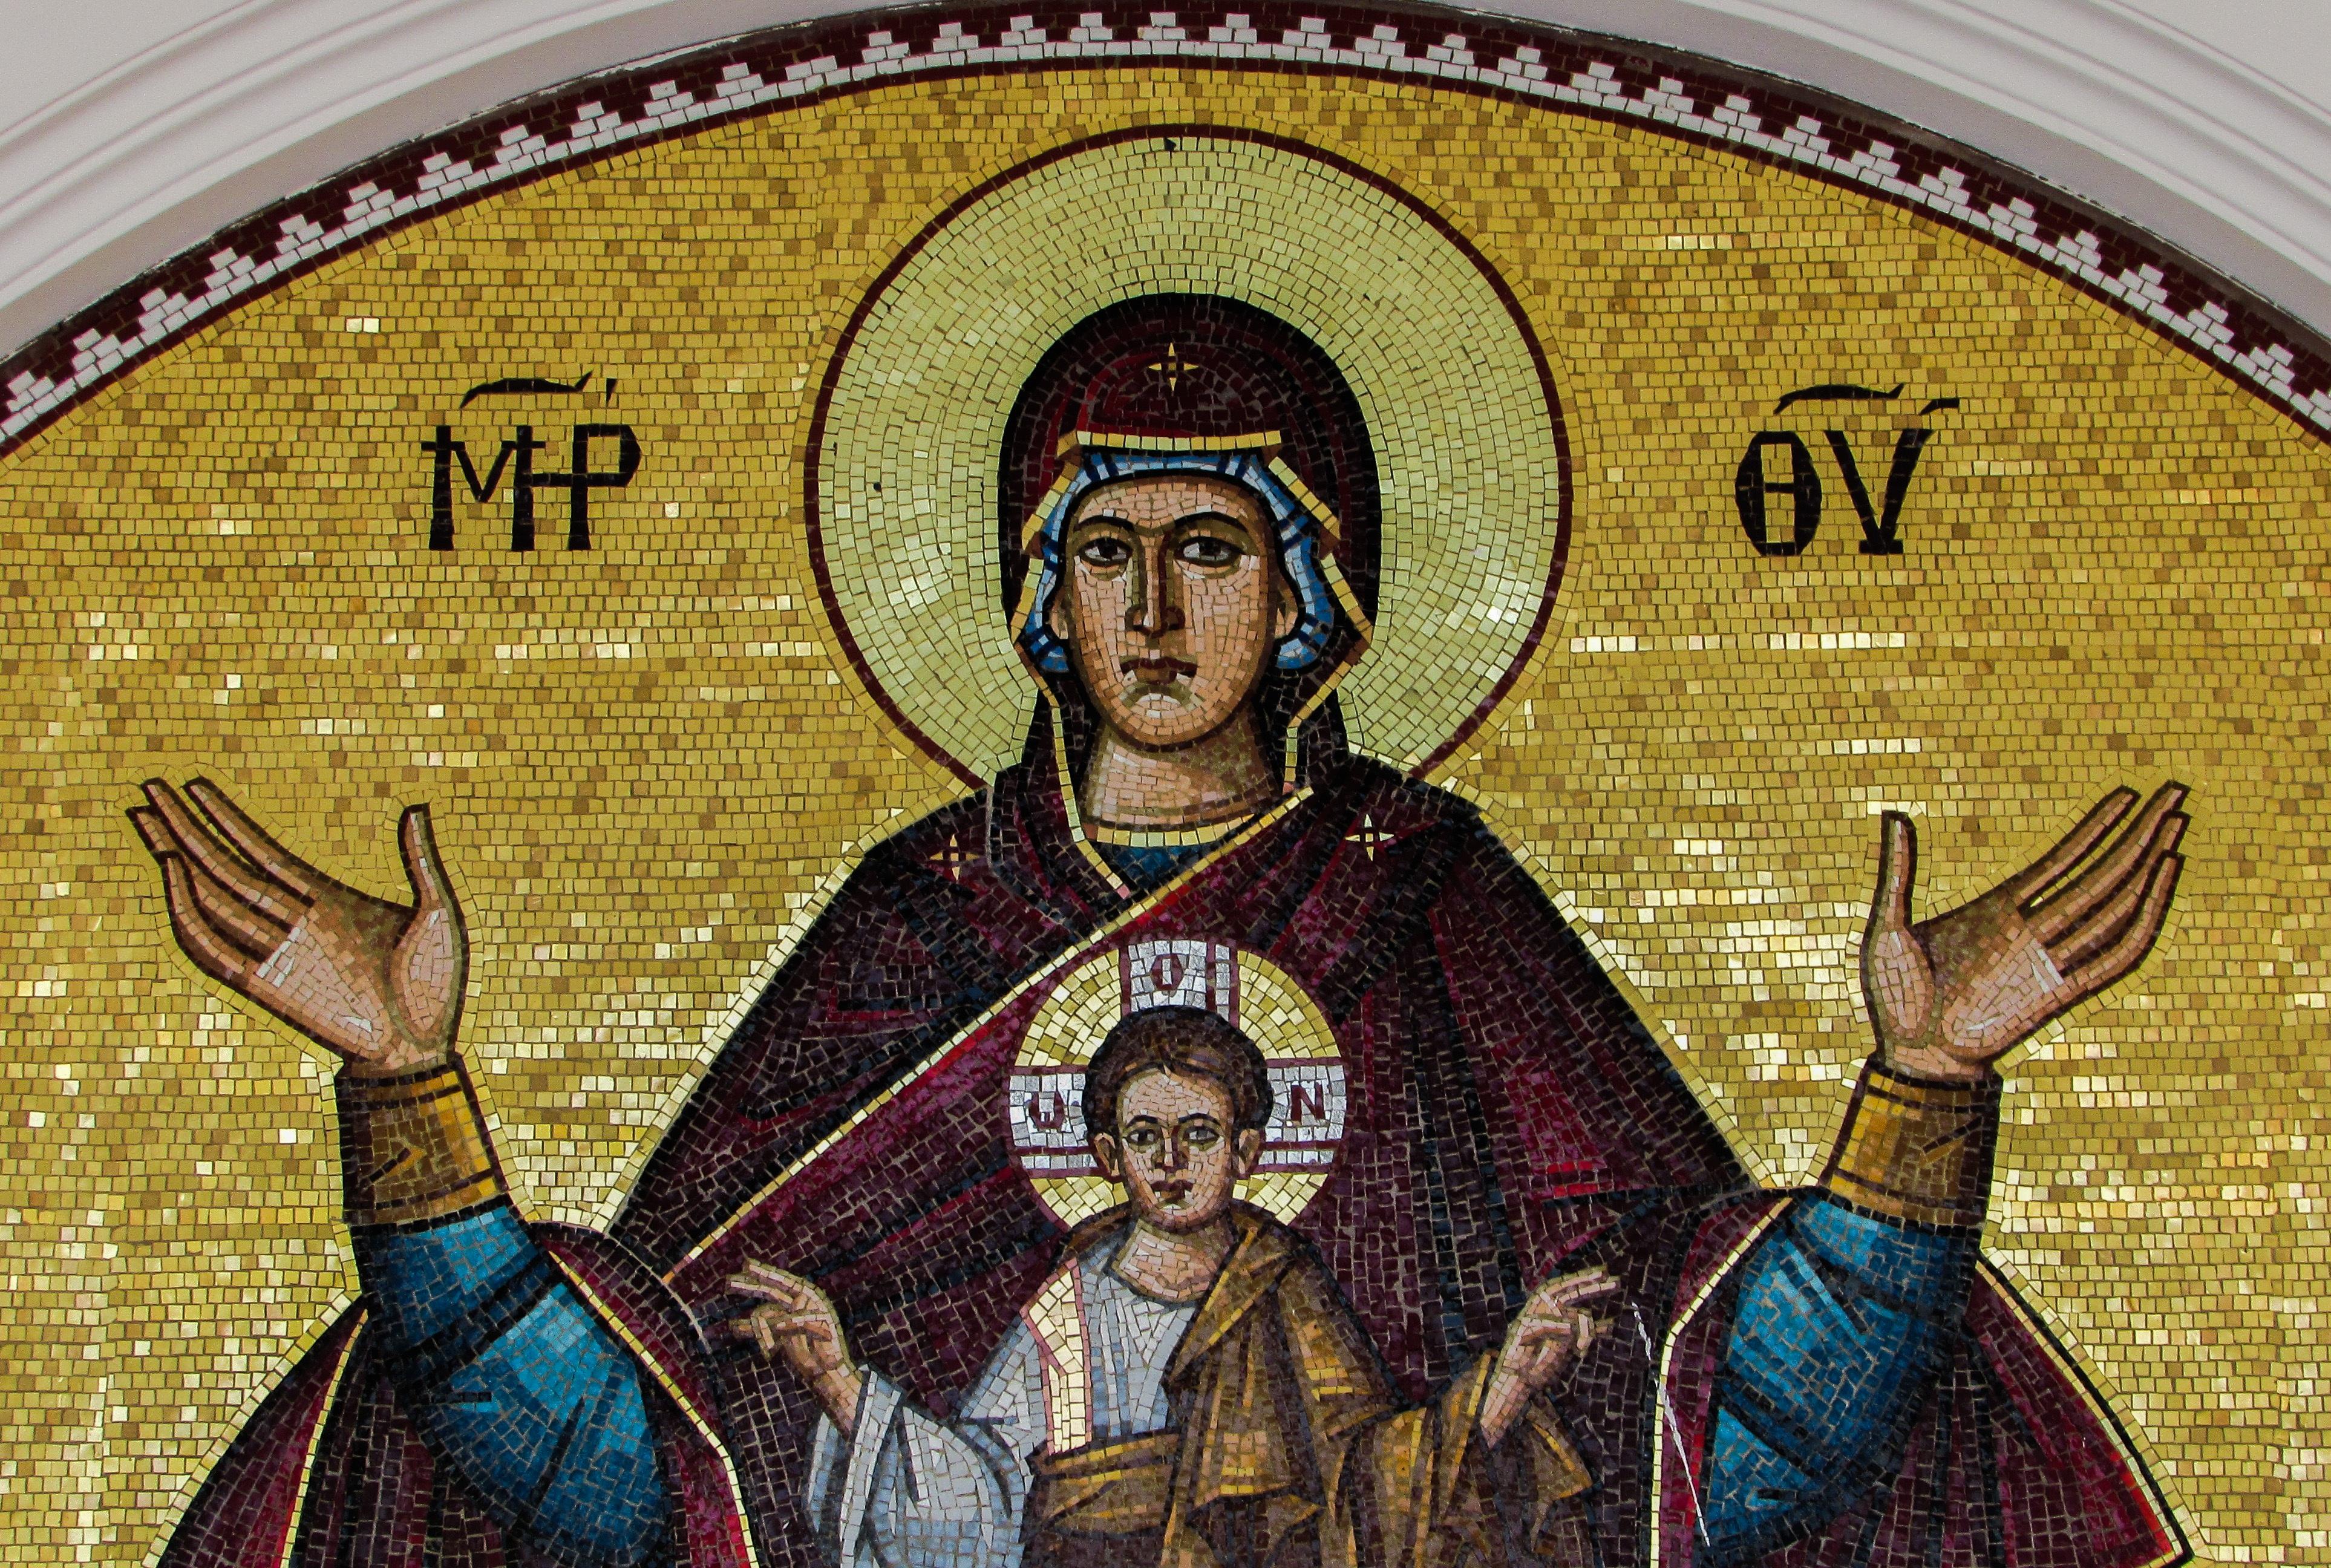 Free Images : window, glass, religion, church, art, mosaic ...